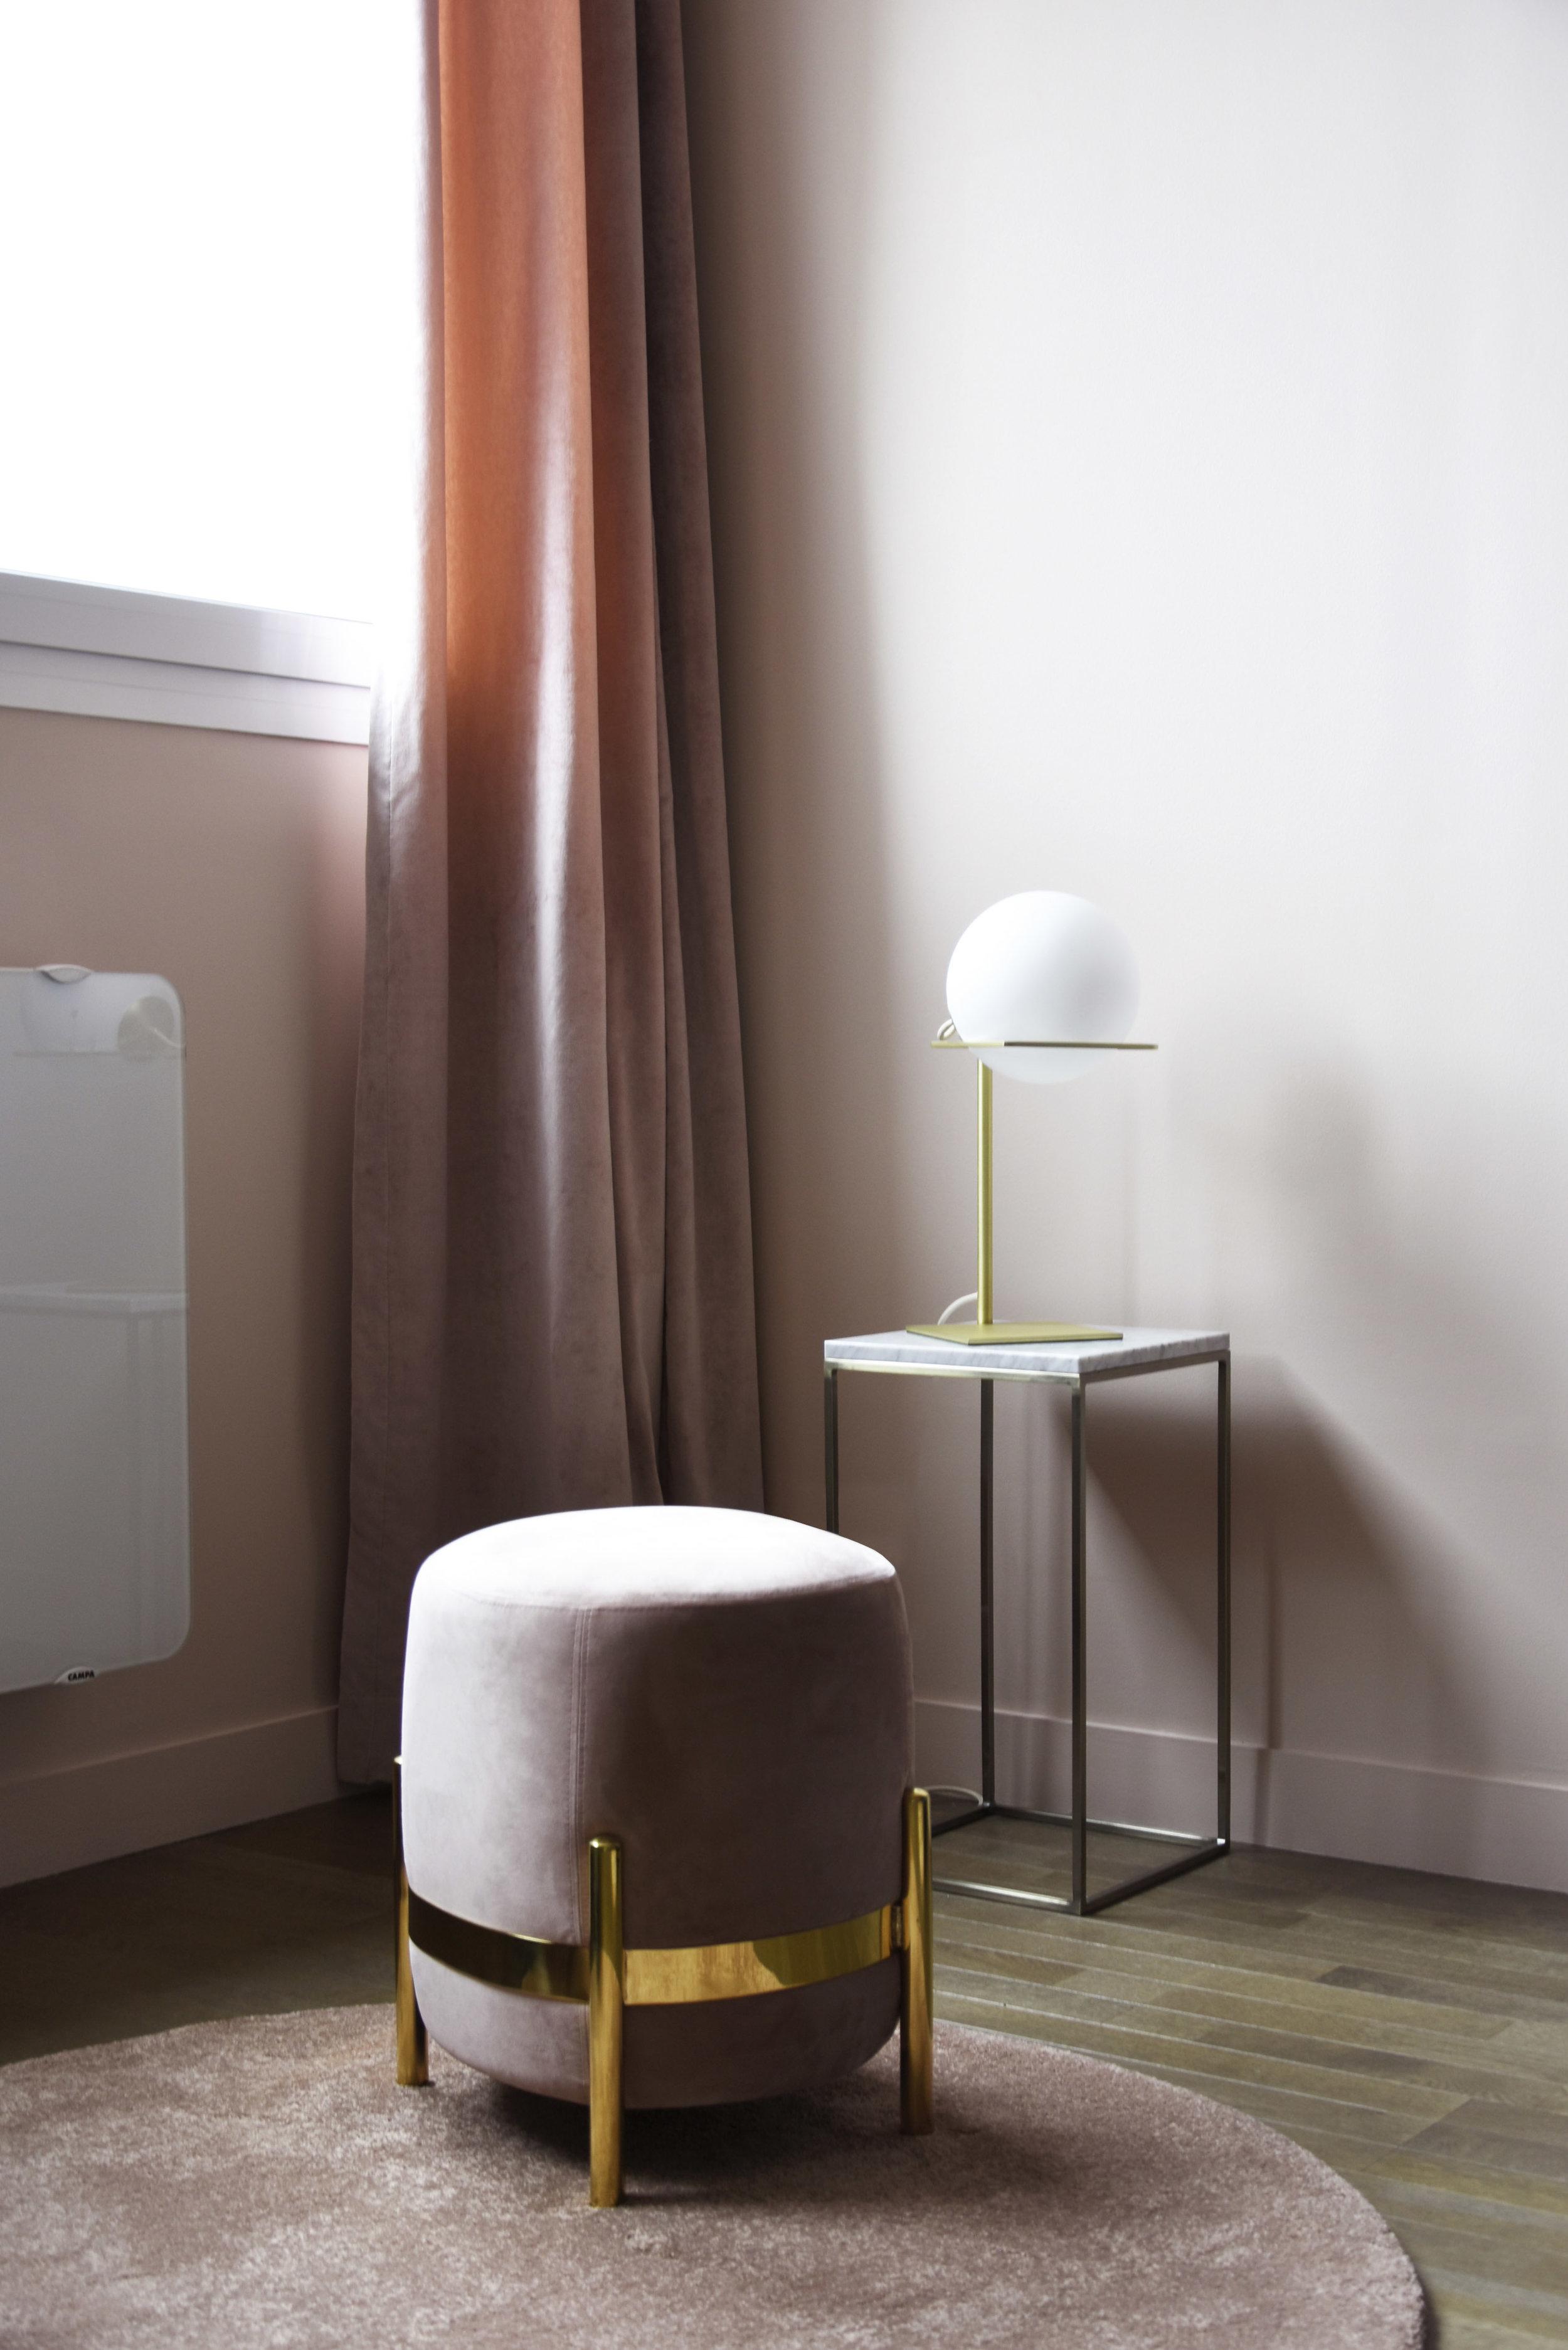 GALERIE LAFAYETTE espace client premium / VEGA pouf & GIN lamp